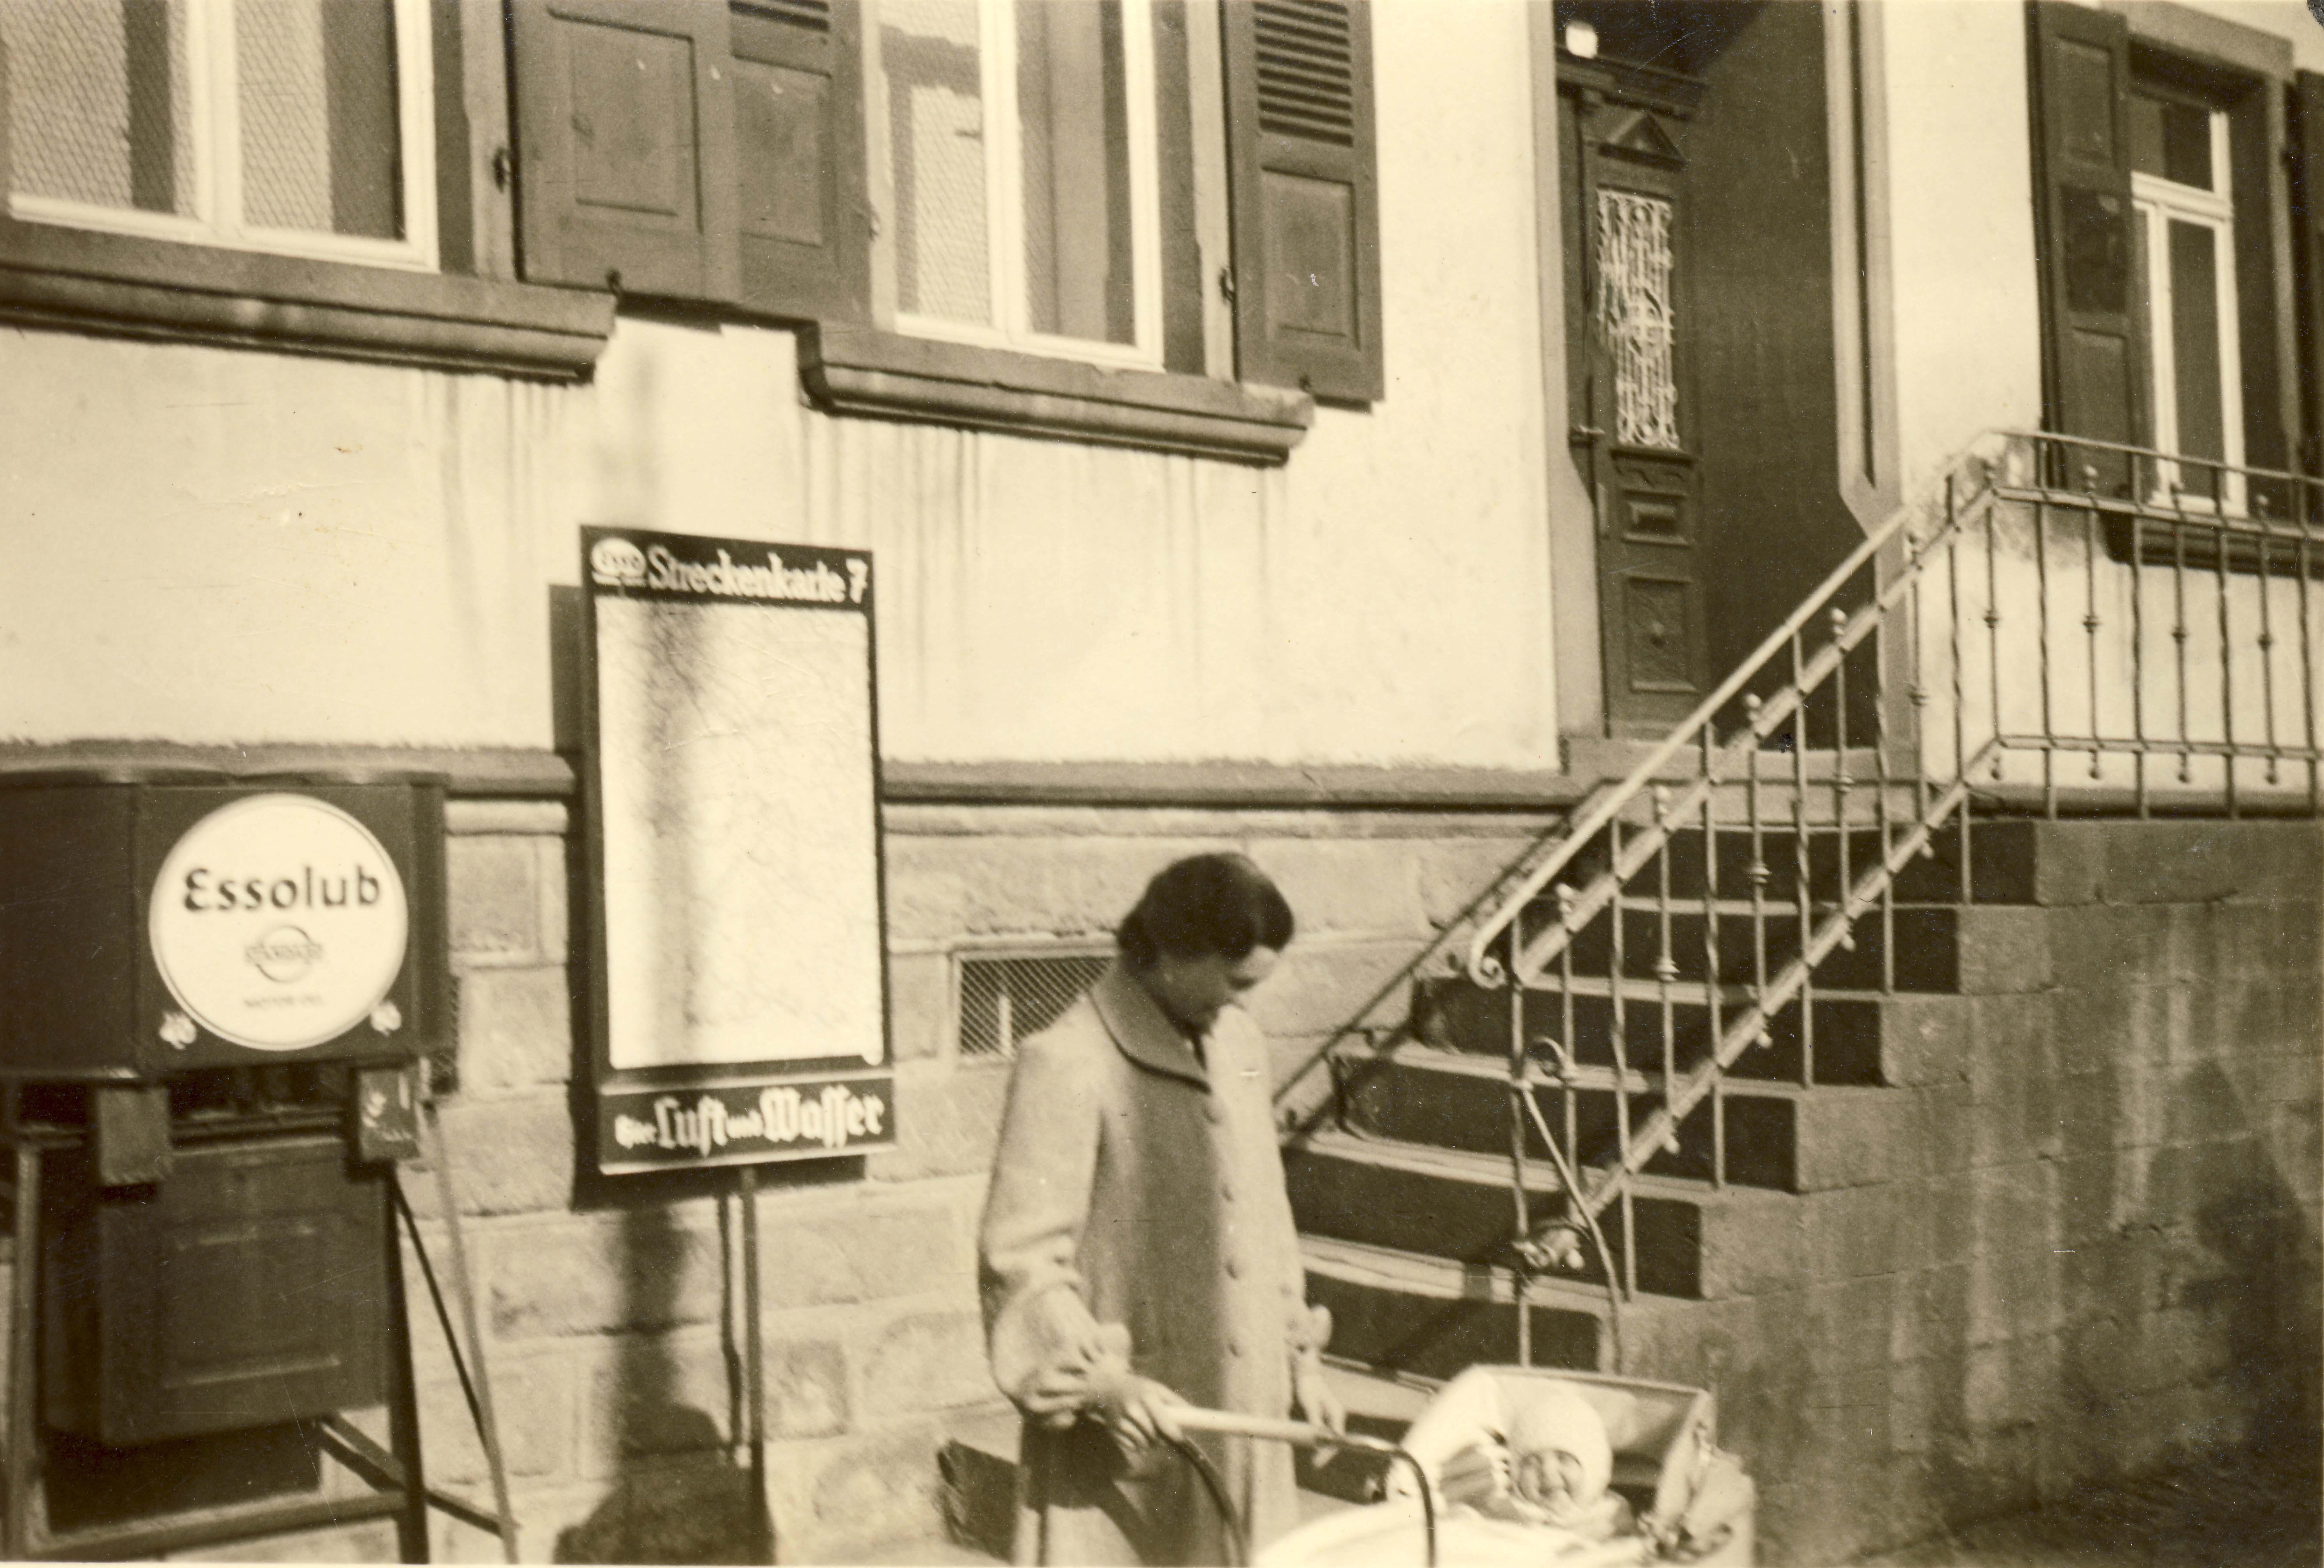 Tanksäule vor dem Wohnhaus Mahler